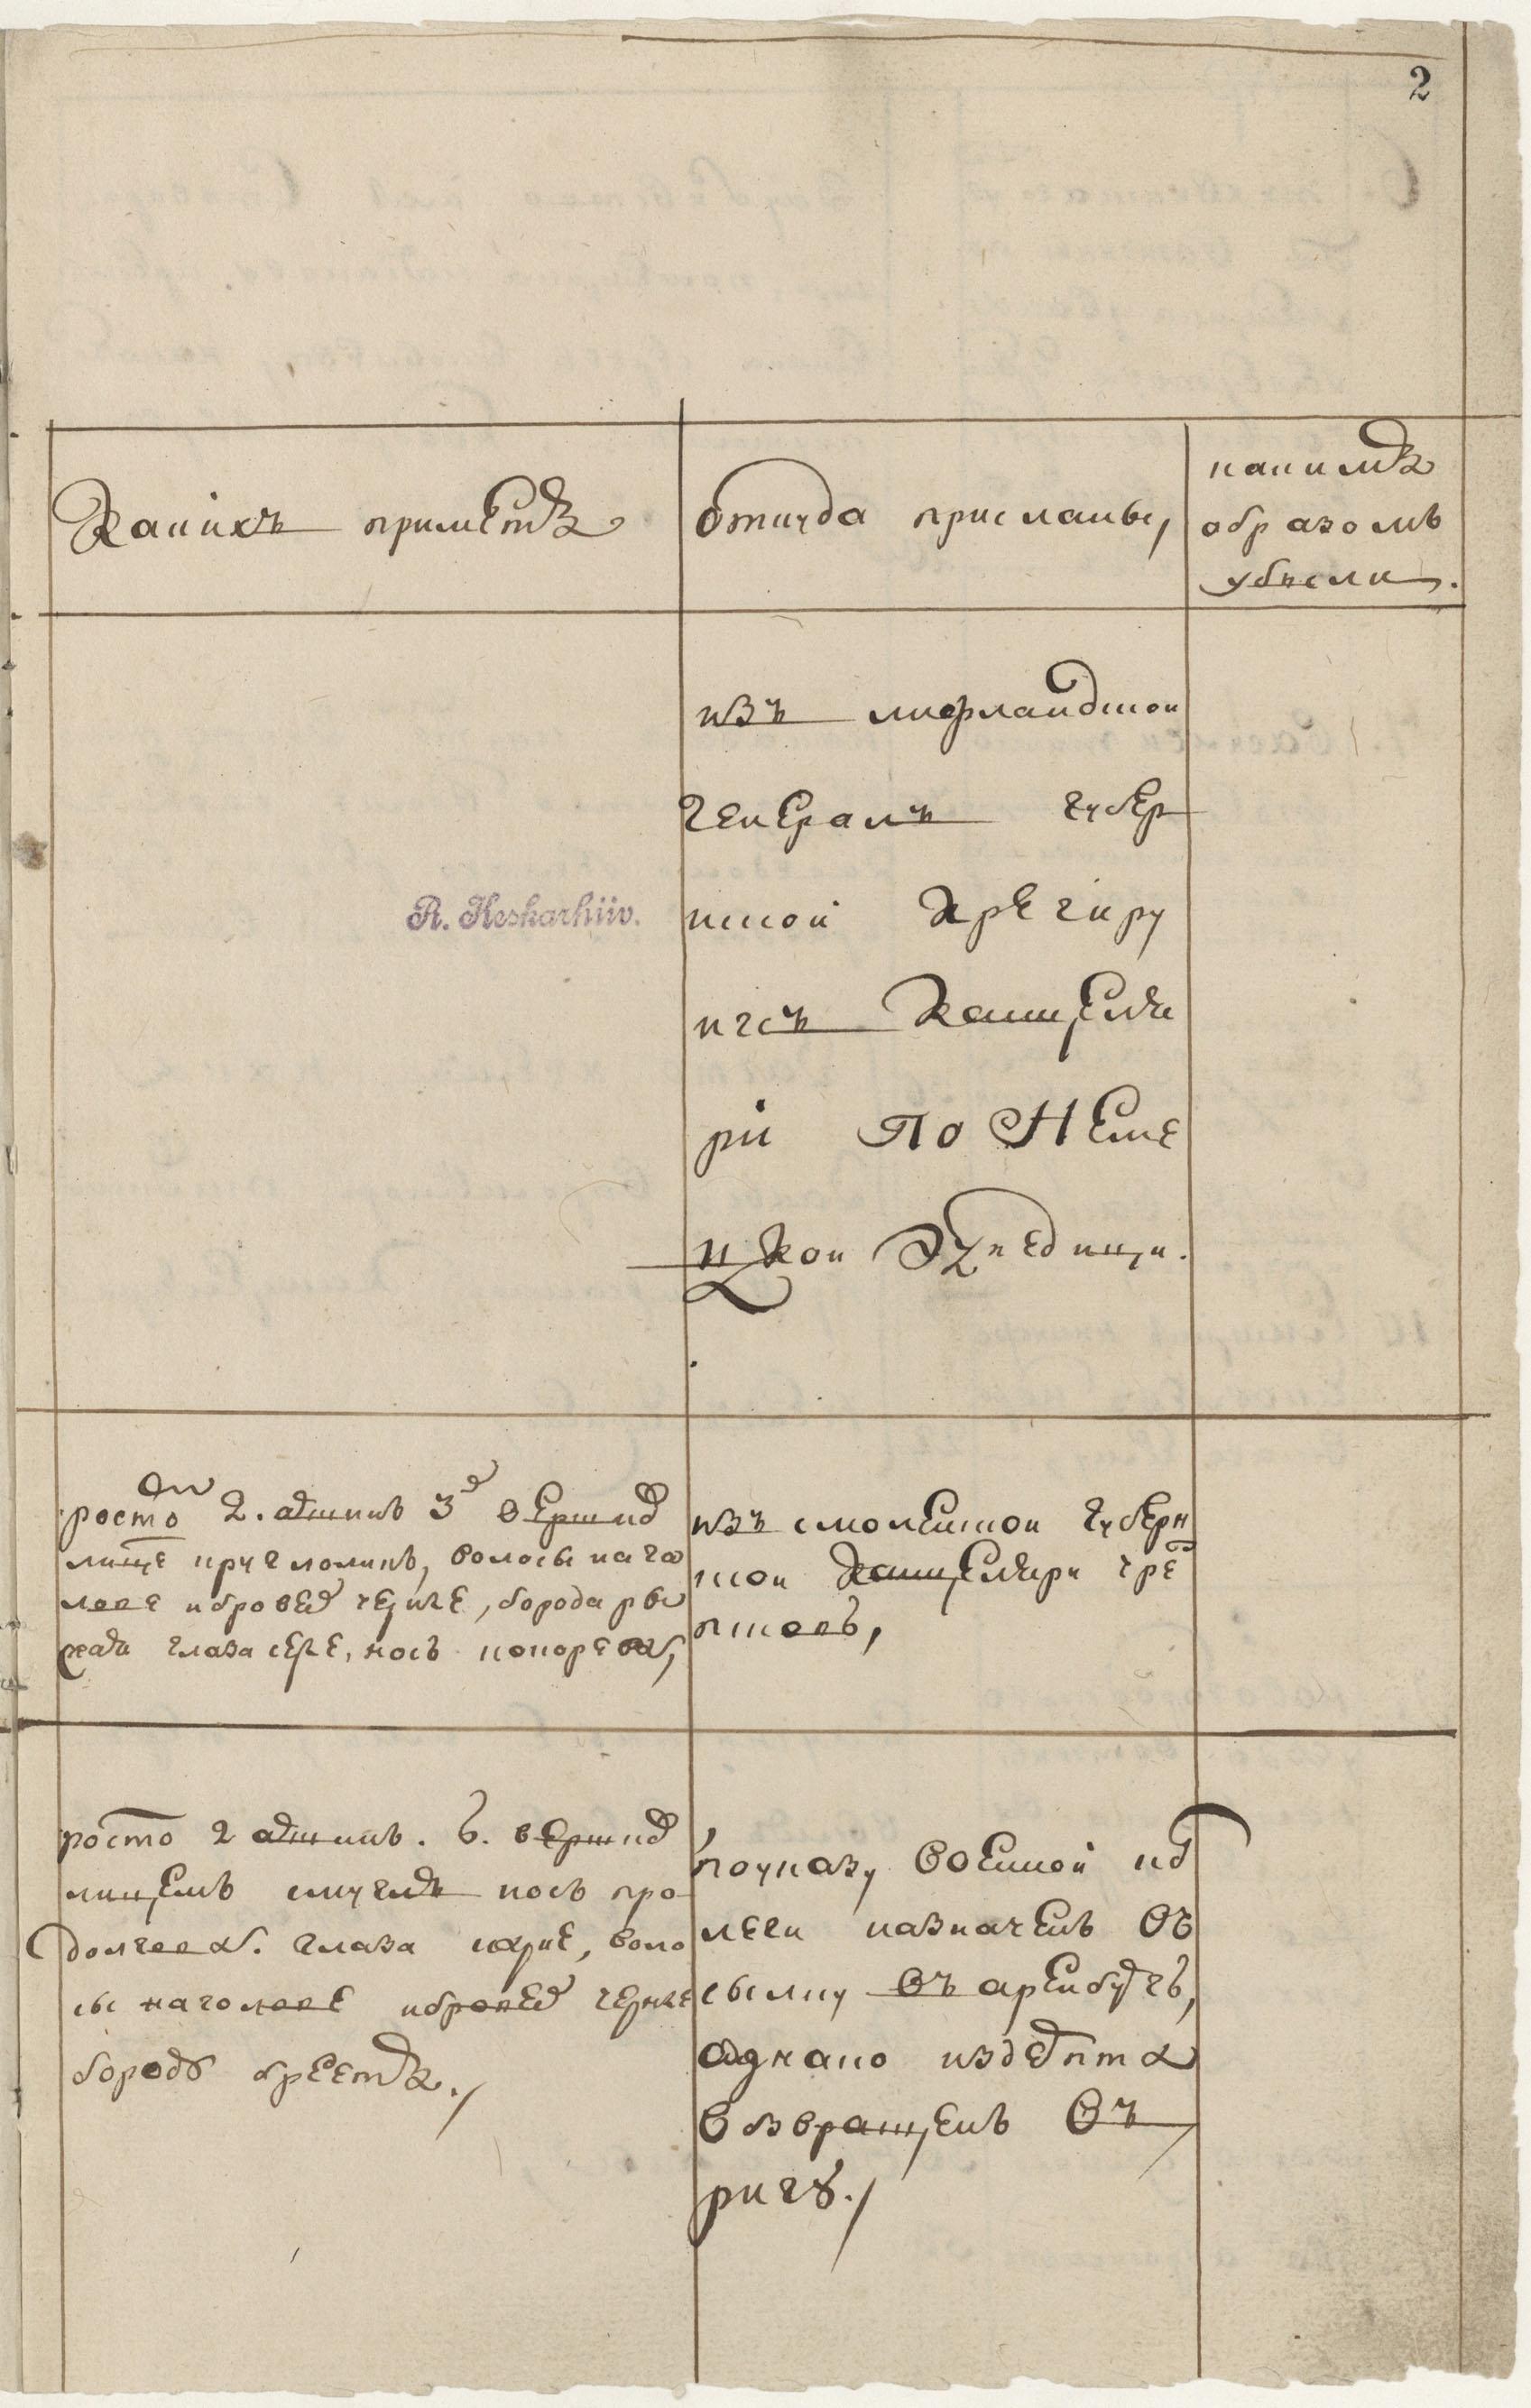 Kivisilla ehituse sunnitööliste nimekirjad 1778. a. EAA.279.1.598